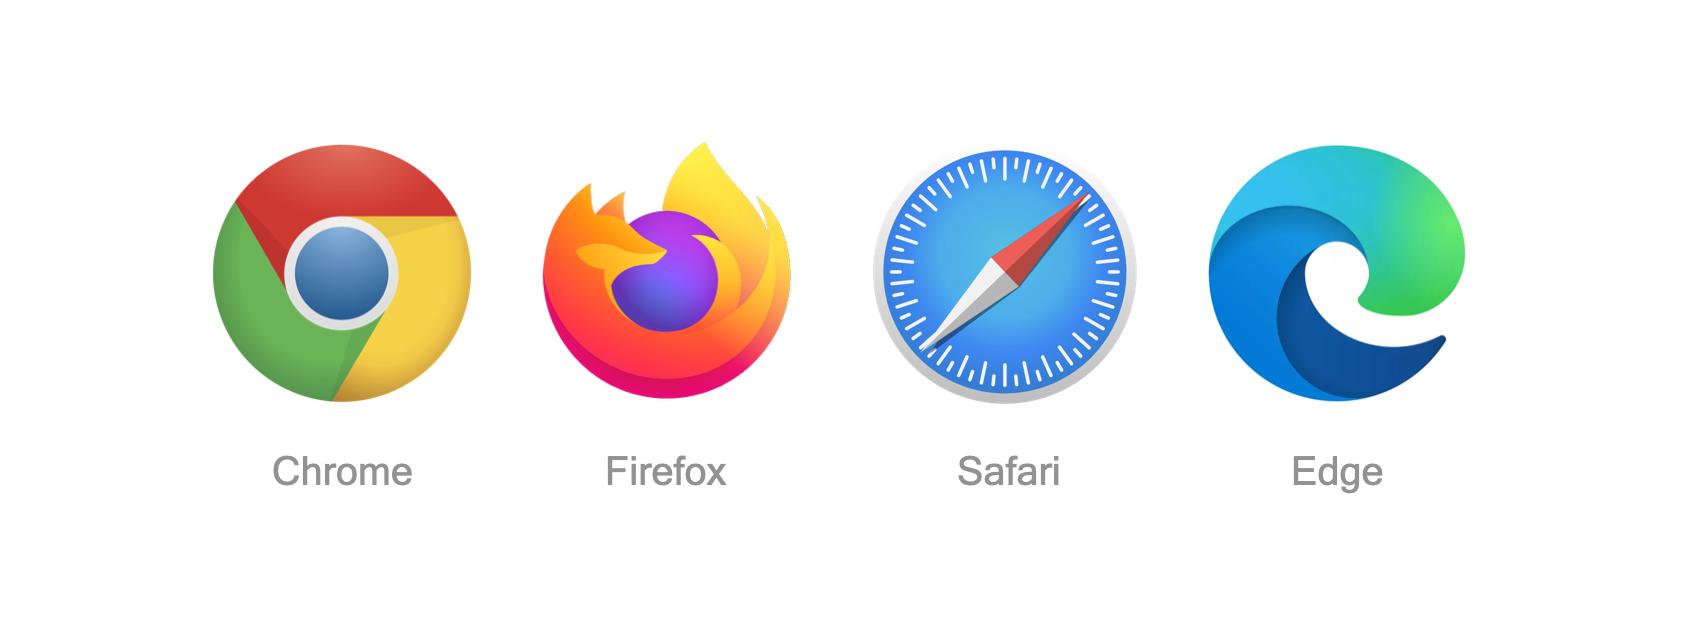 Browsers logos